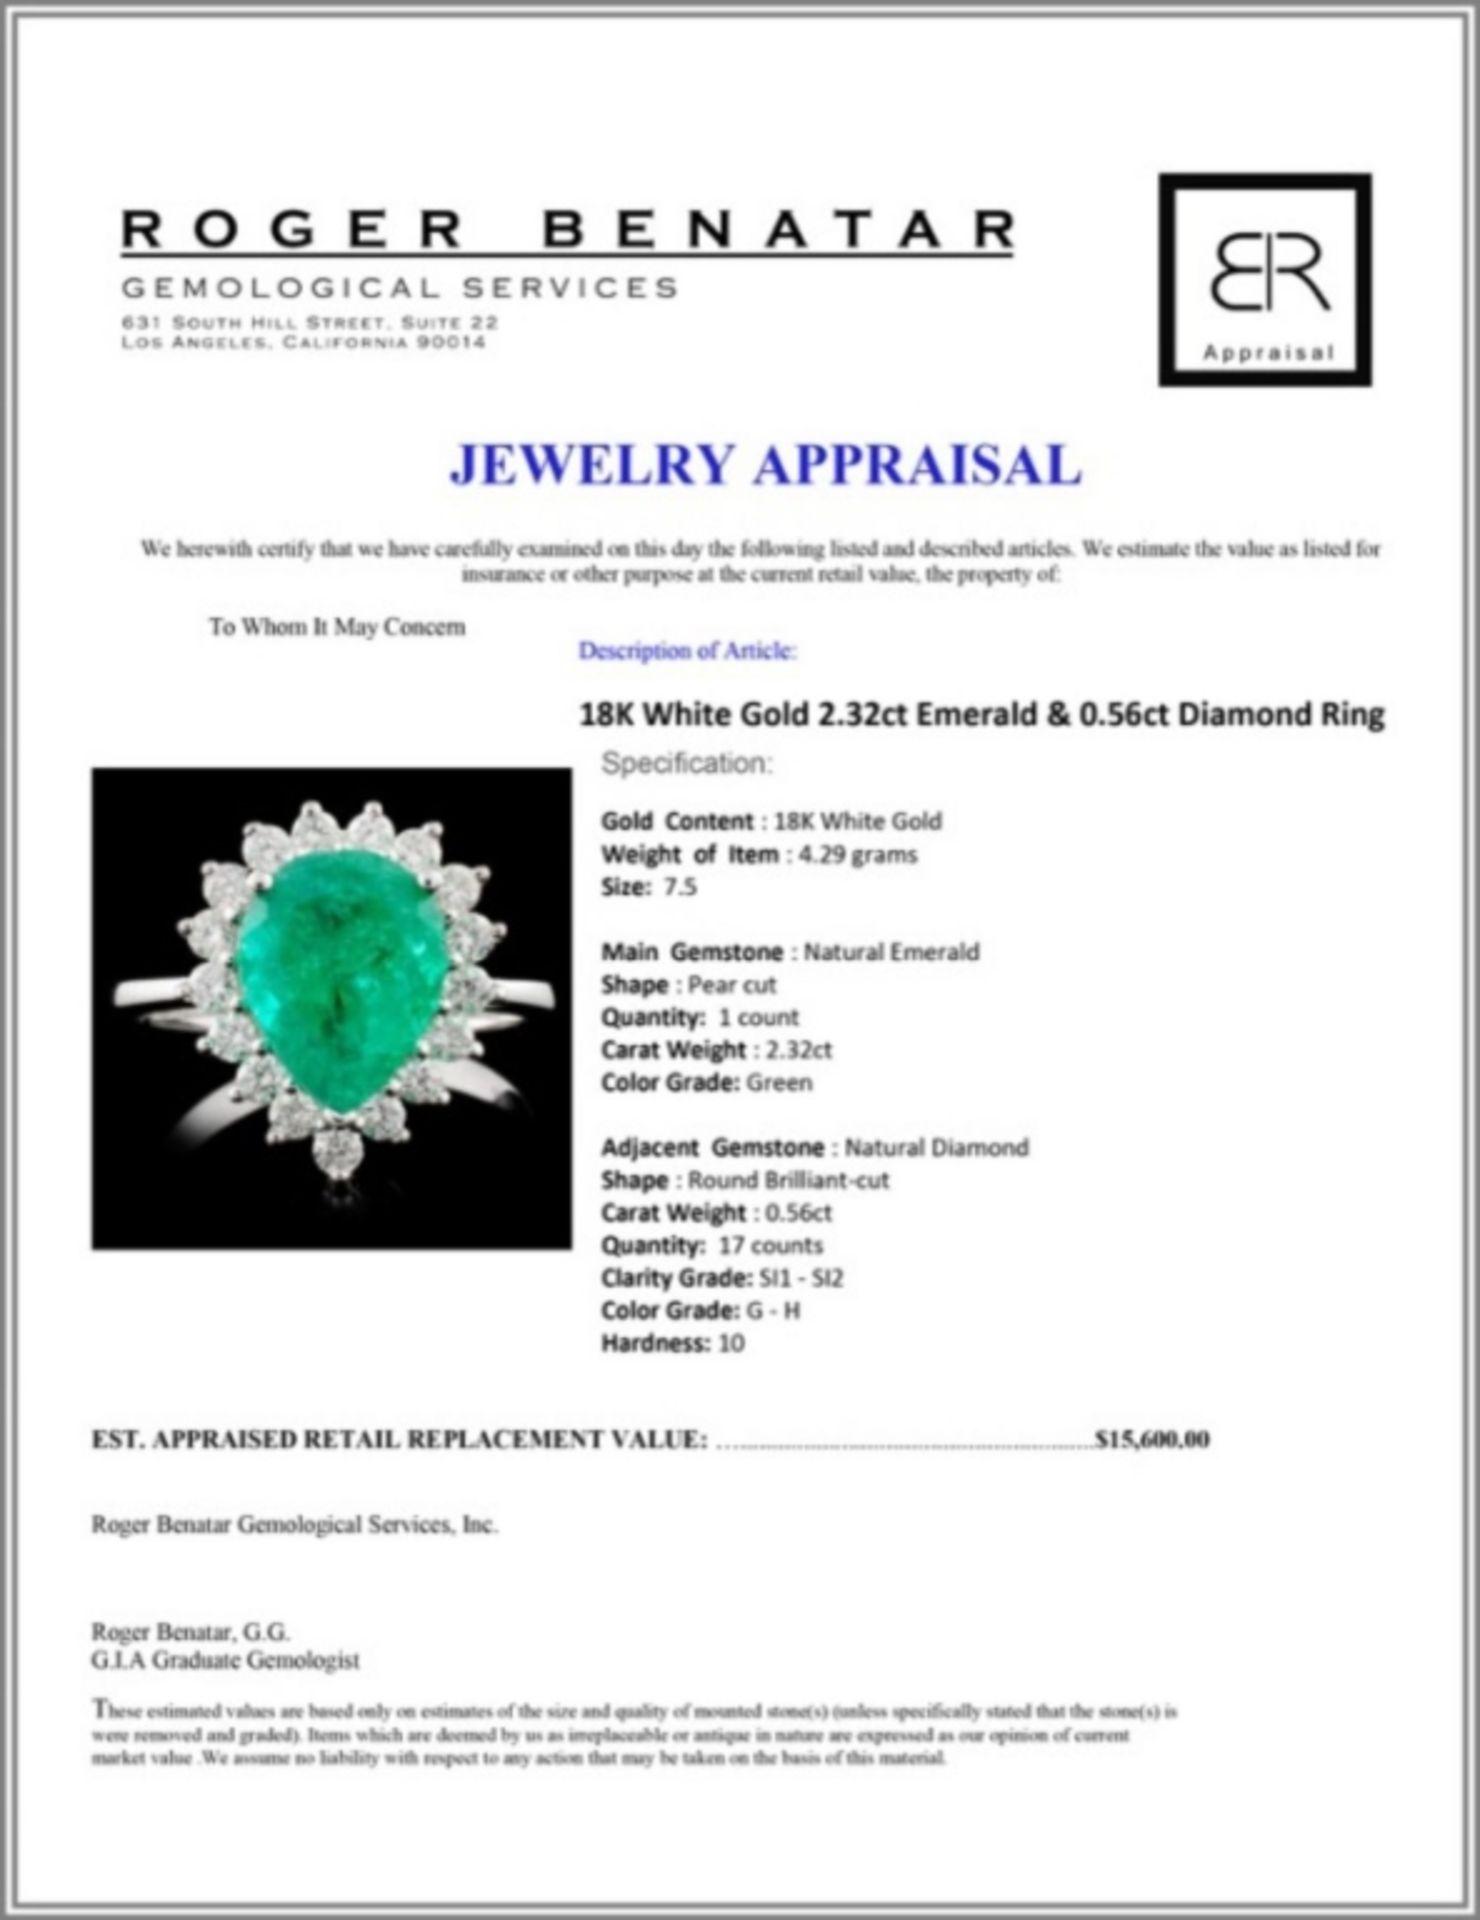 18K White Gold 2.32ct Emerald & 0.56ct Diamond Rin - Image 4 of 4